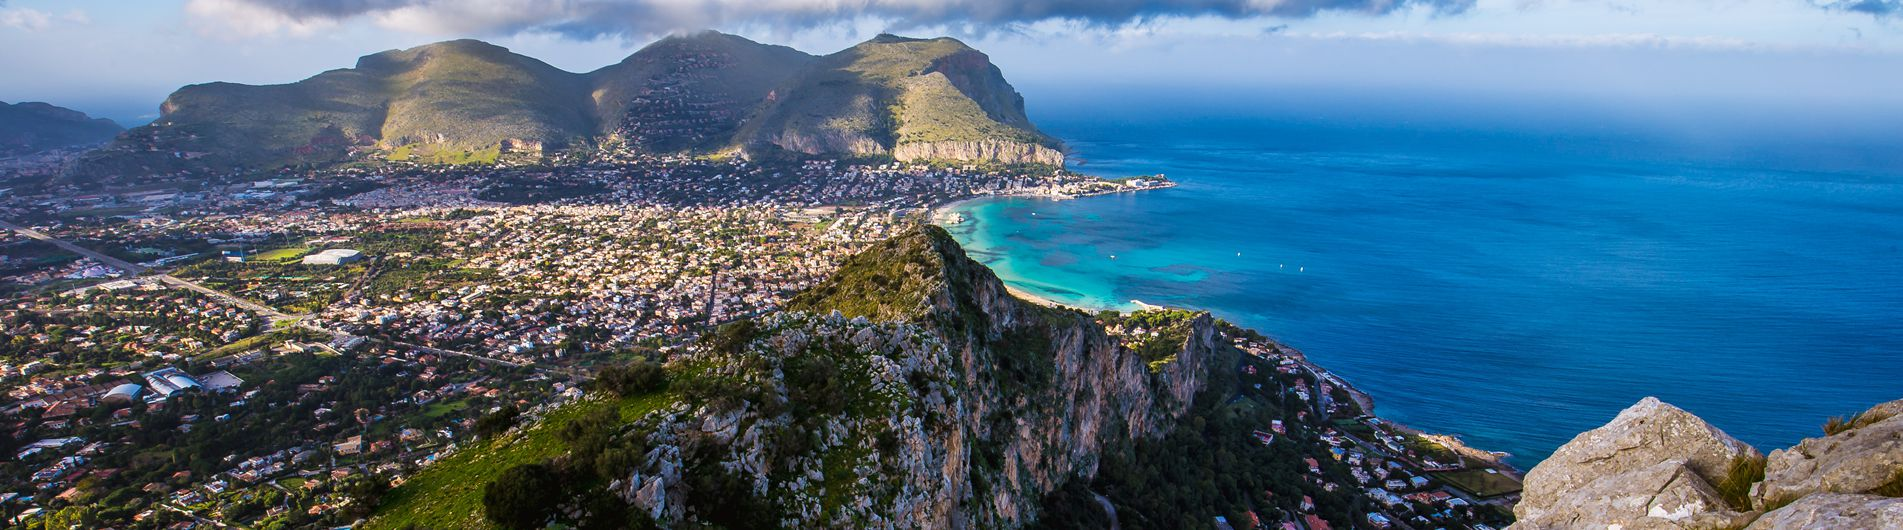 City Break Holidays in Cyprus